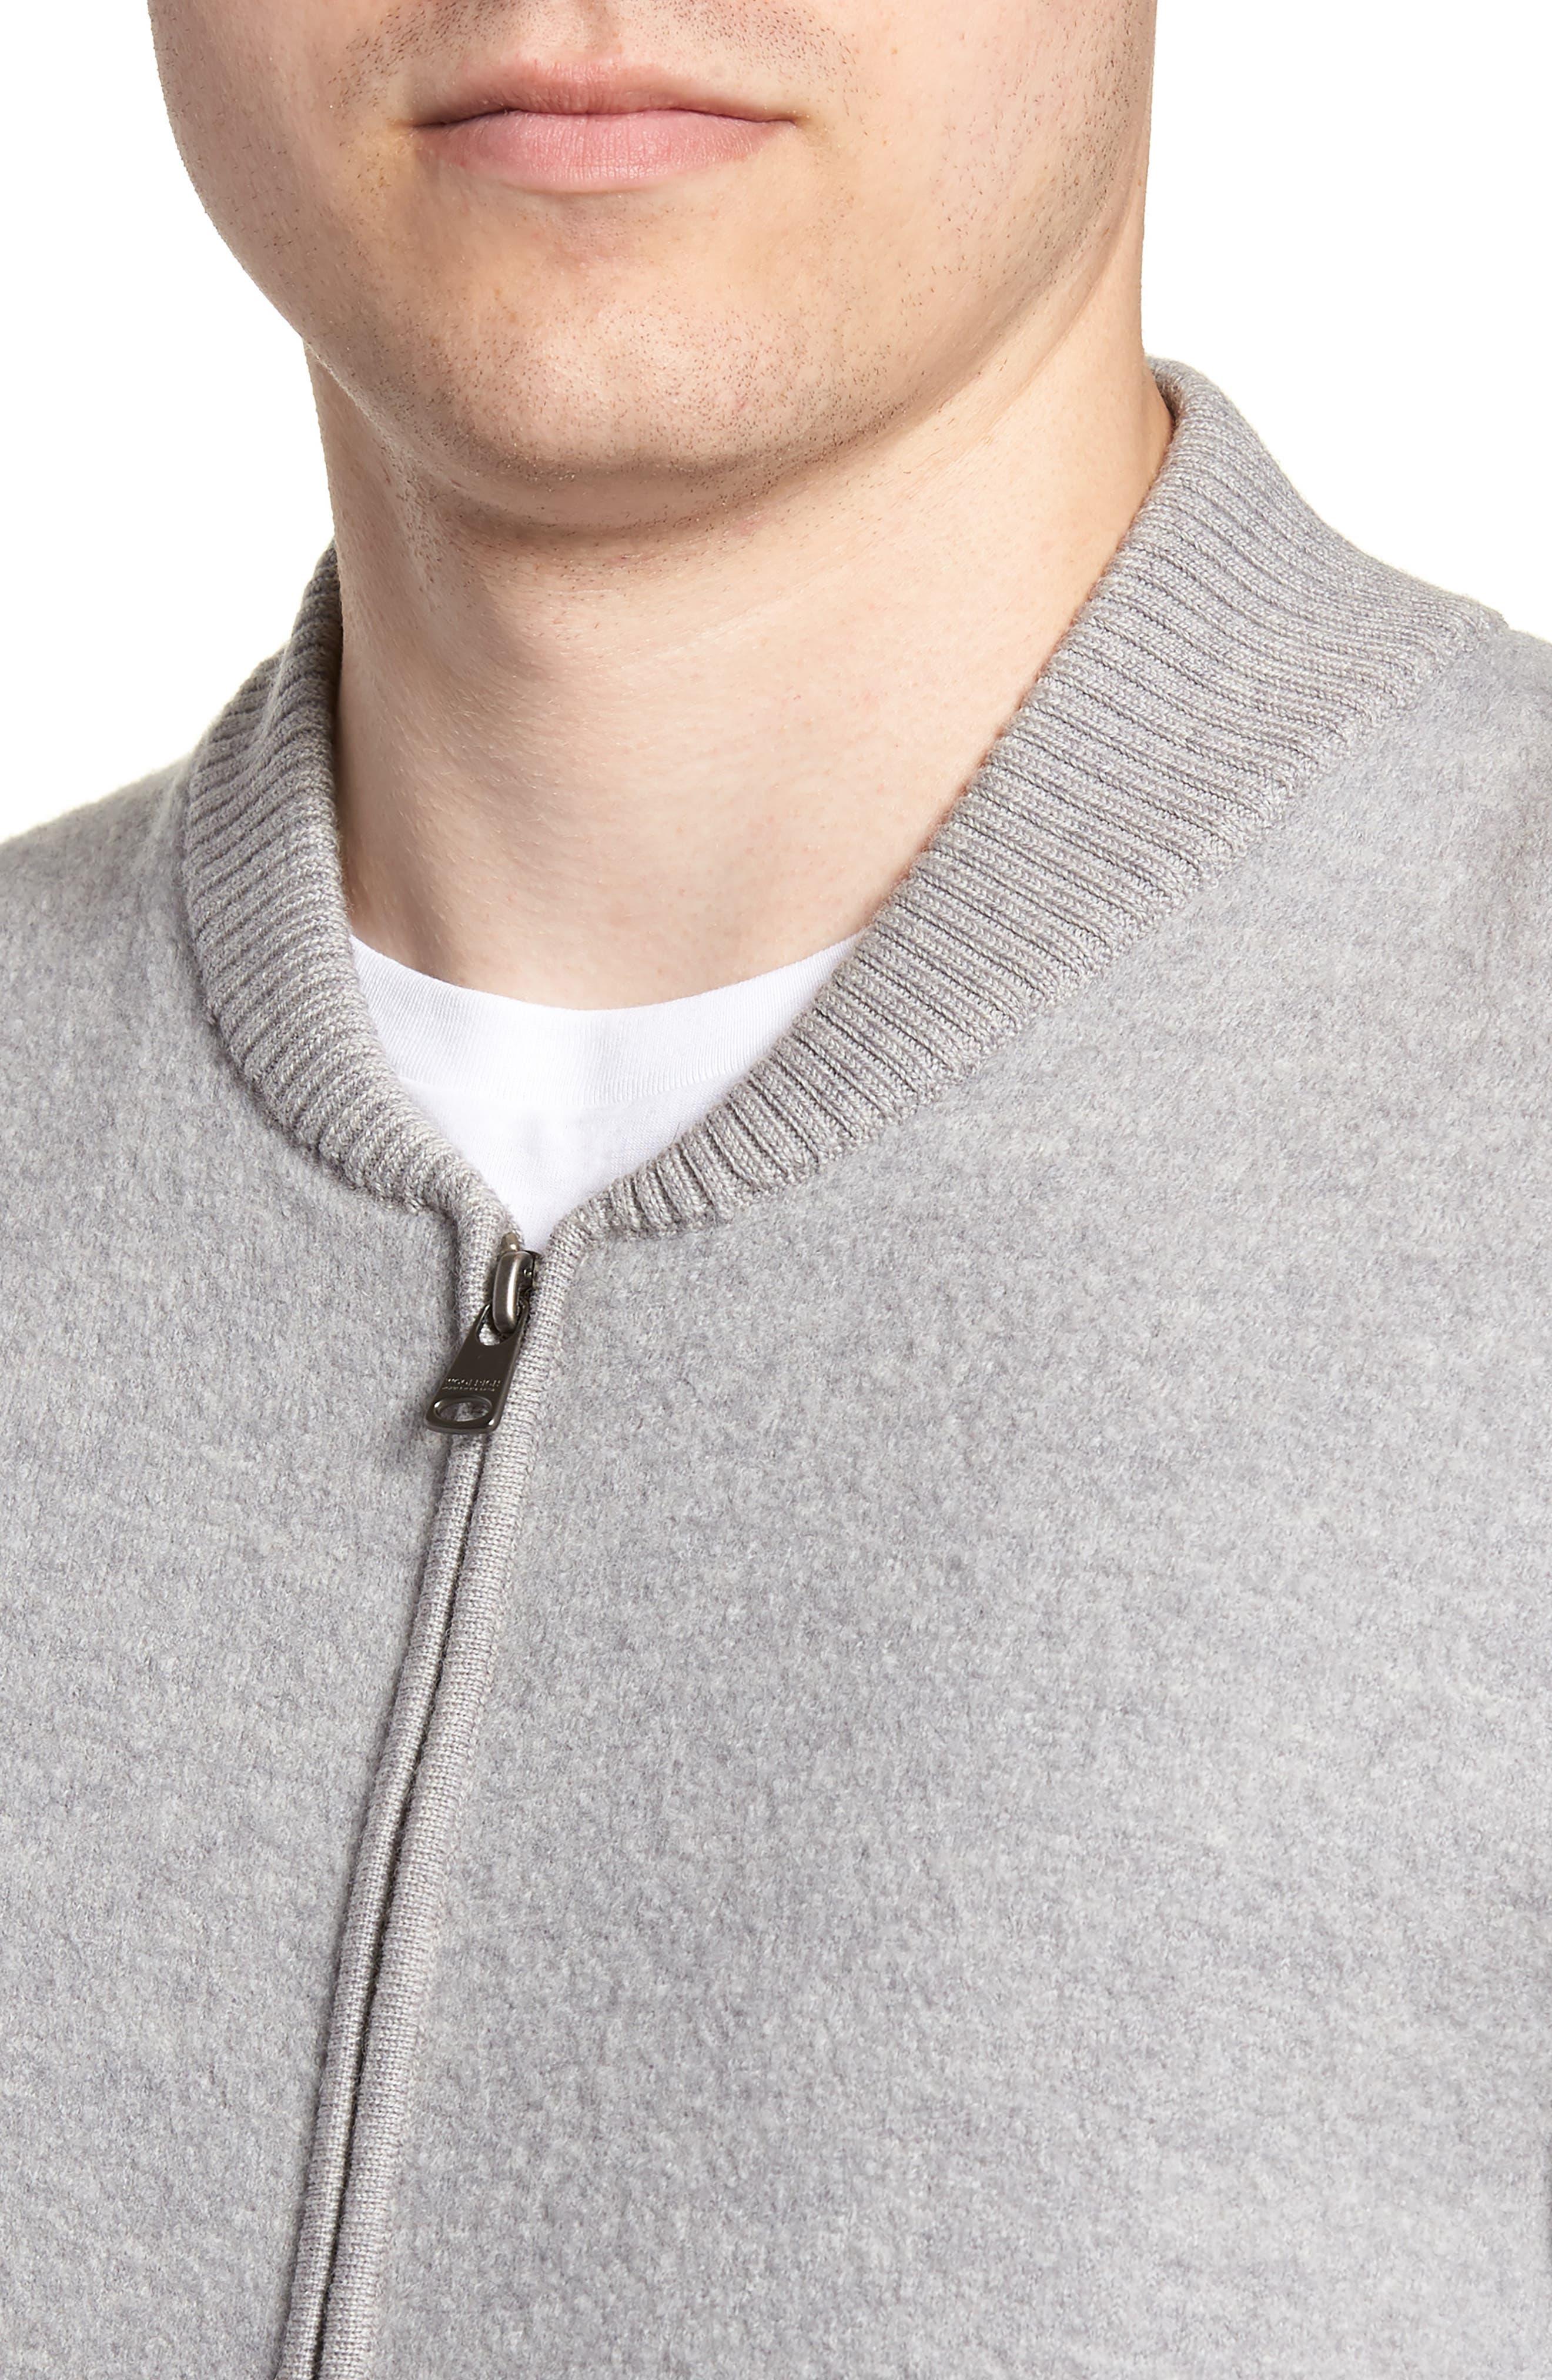 Felted Wool Bomber Jacket,                             Alternate thumbnail 4, color,                             LIGHT GREY MELANGE